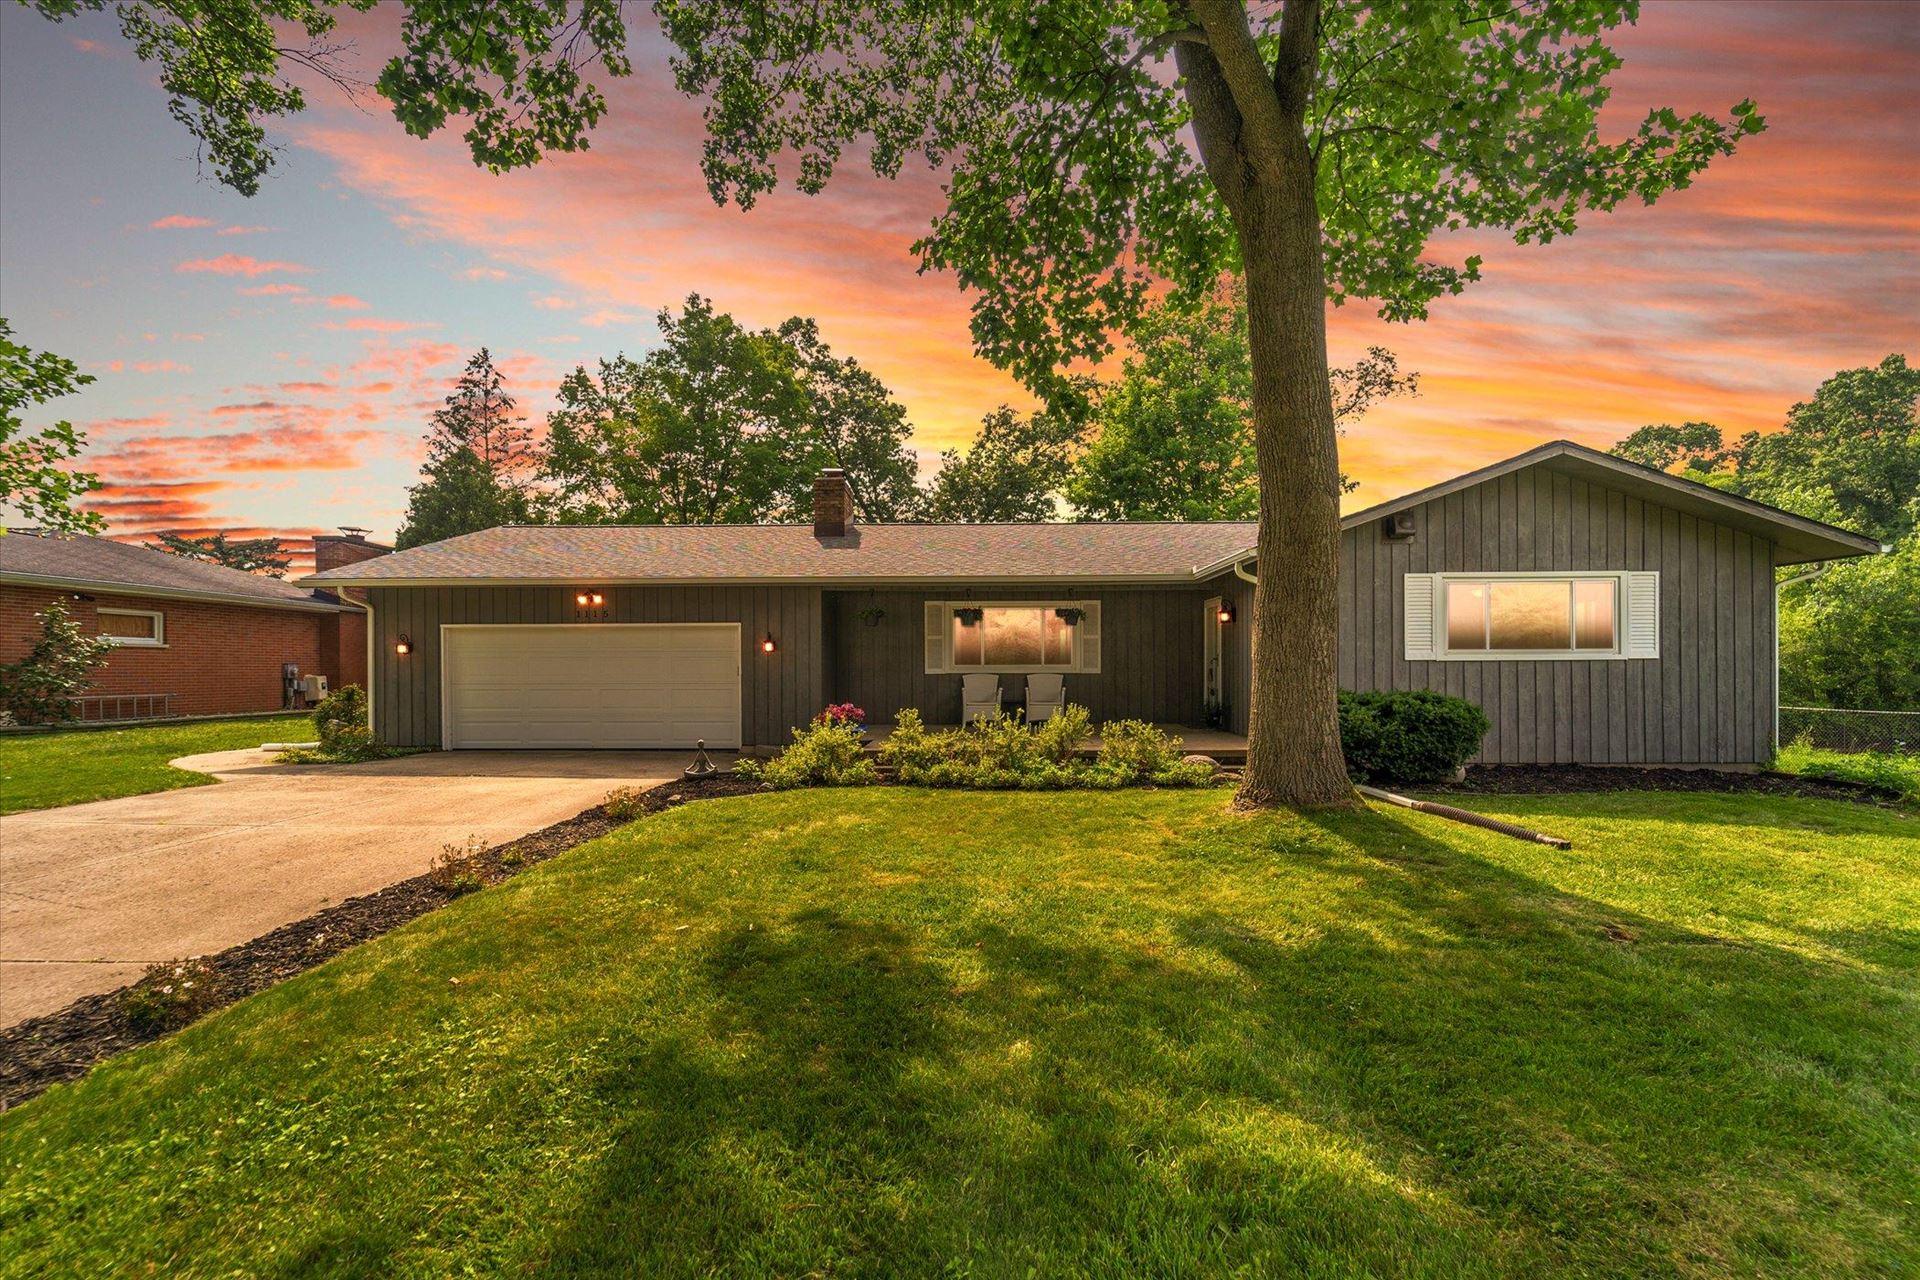 1115 Bunkerhill Drive Drive, Kalamazoo, MI 49009 - MLS#: 21095420